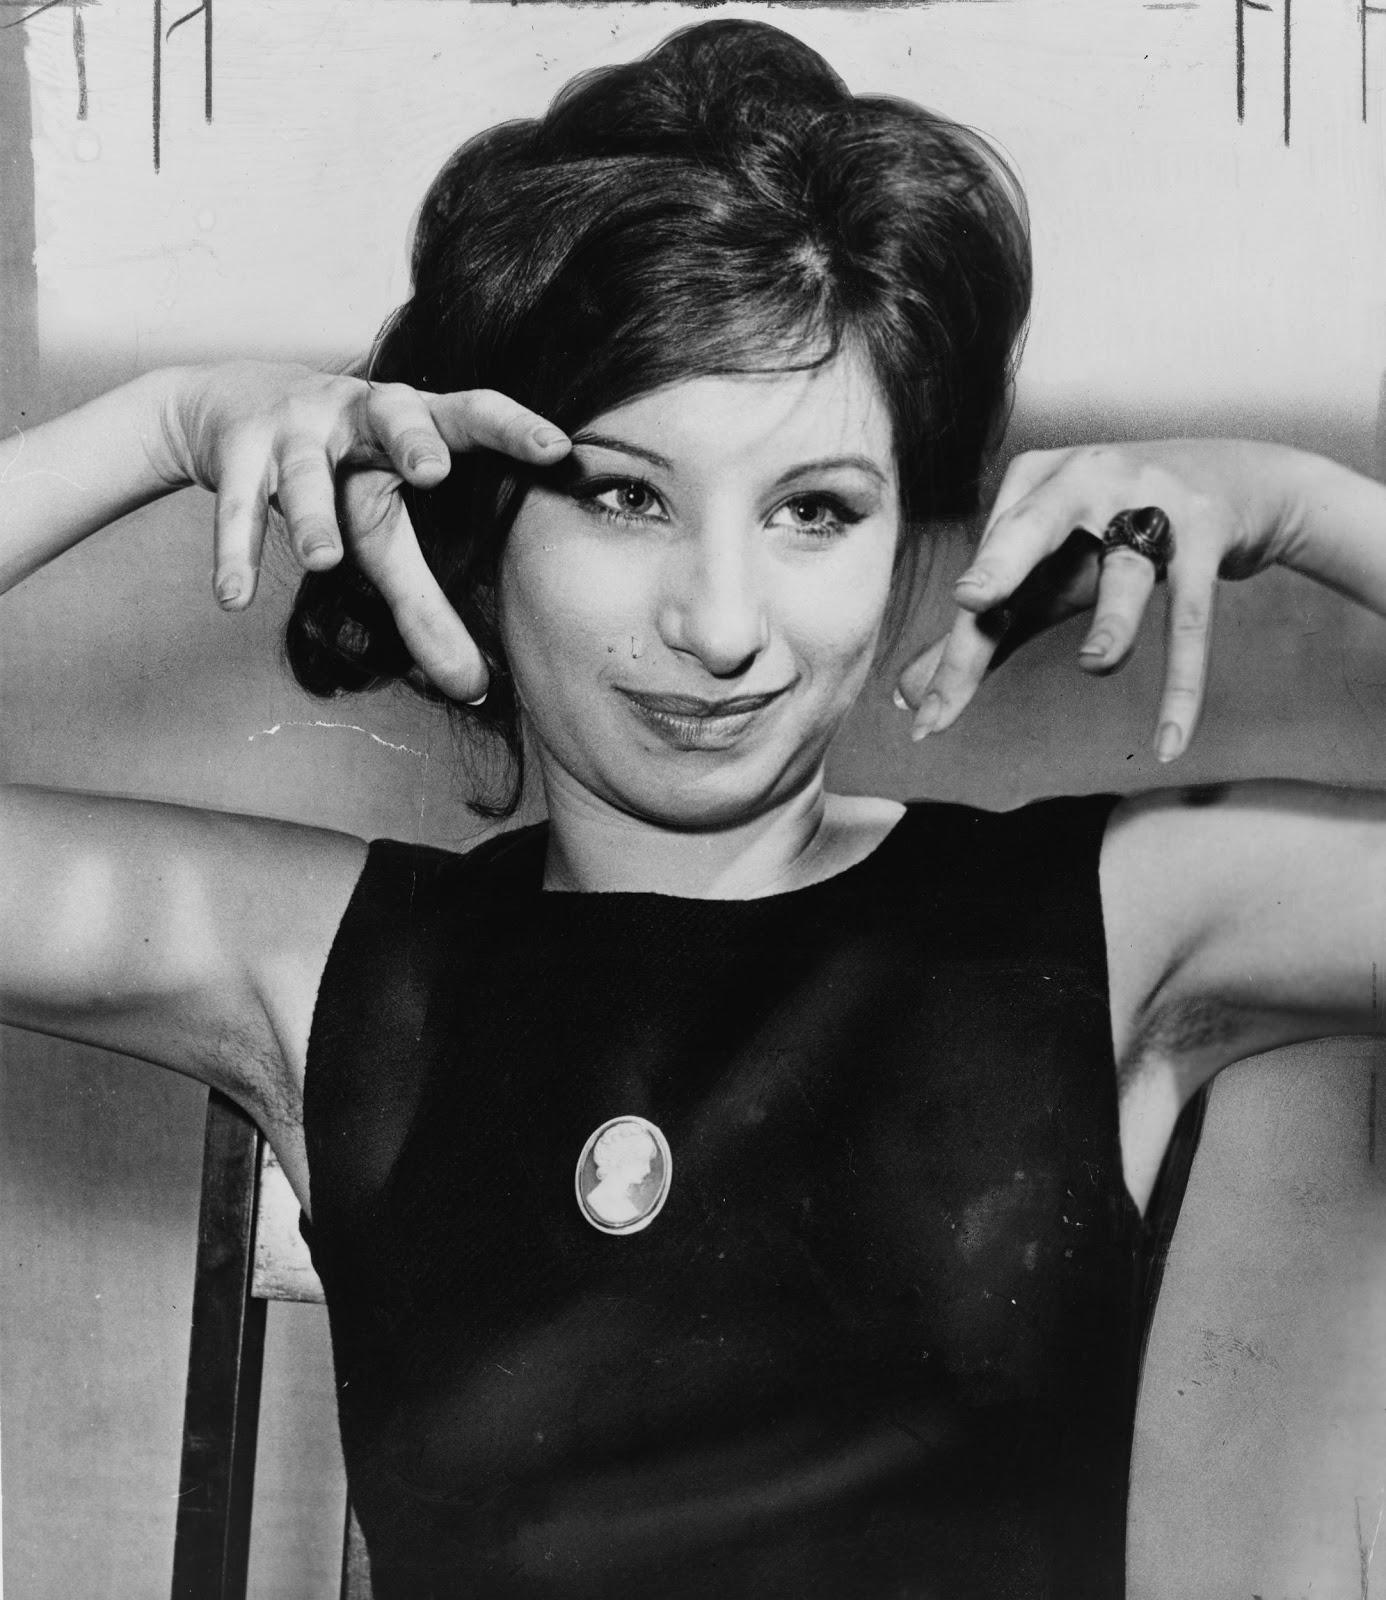 http://3.bp.blogspot.com/_zyd-BpPFY9Q/TSytTA9a9NI/AAAAAAAAAMs/Ndq2siYdMjU/s1600/Barbra_Streisand_1962.jpg